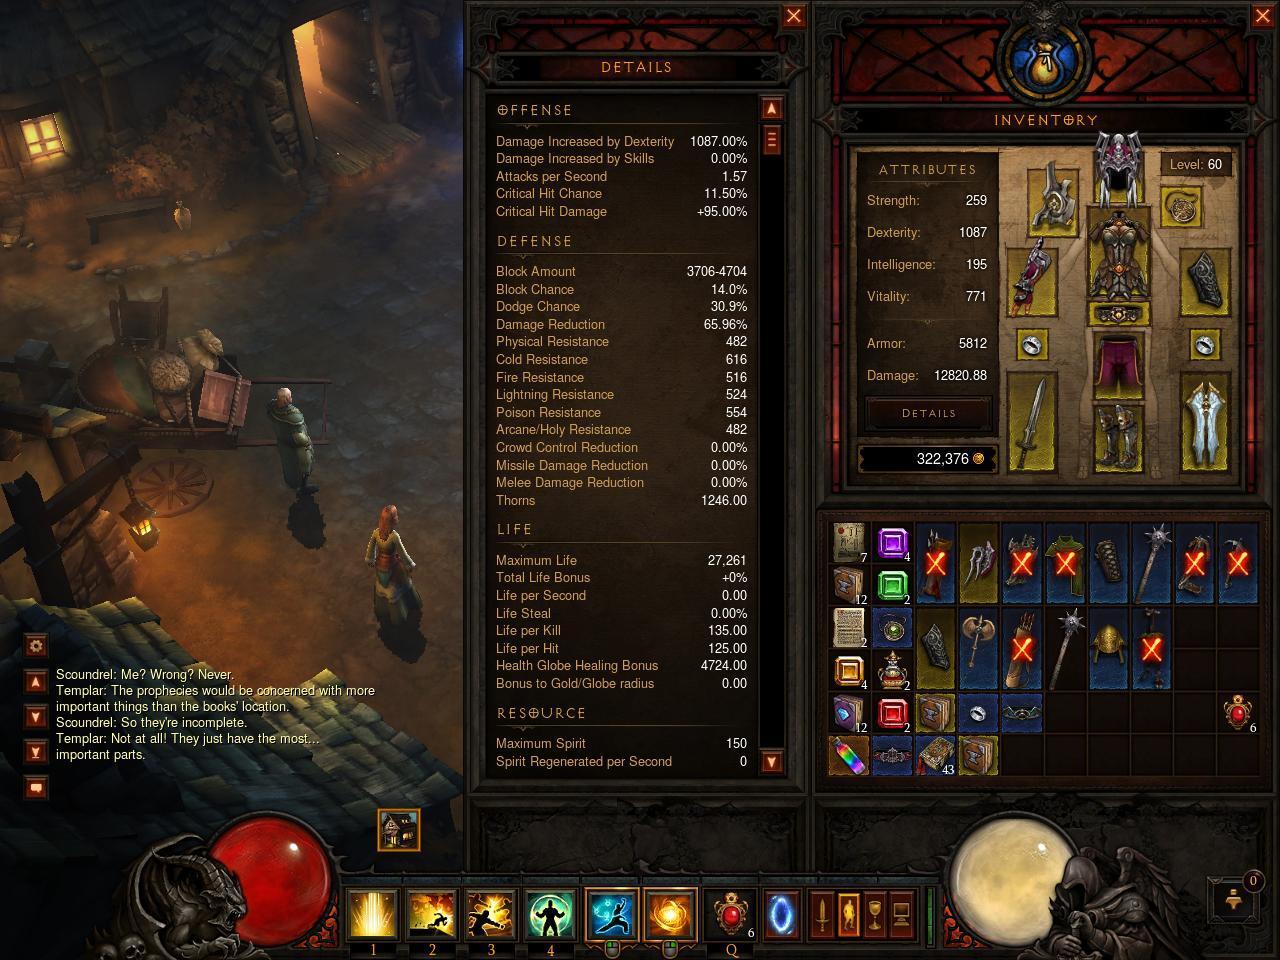 Jual ID Diablo 3 & StarCraft 2 2nd Include Box